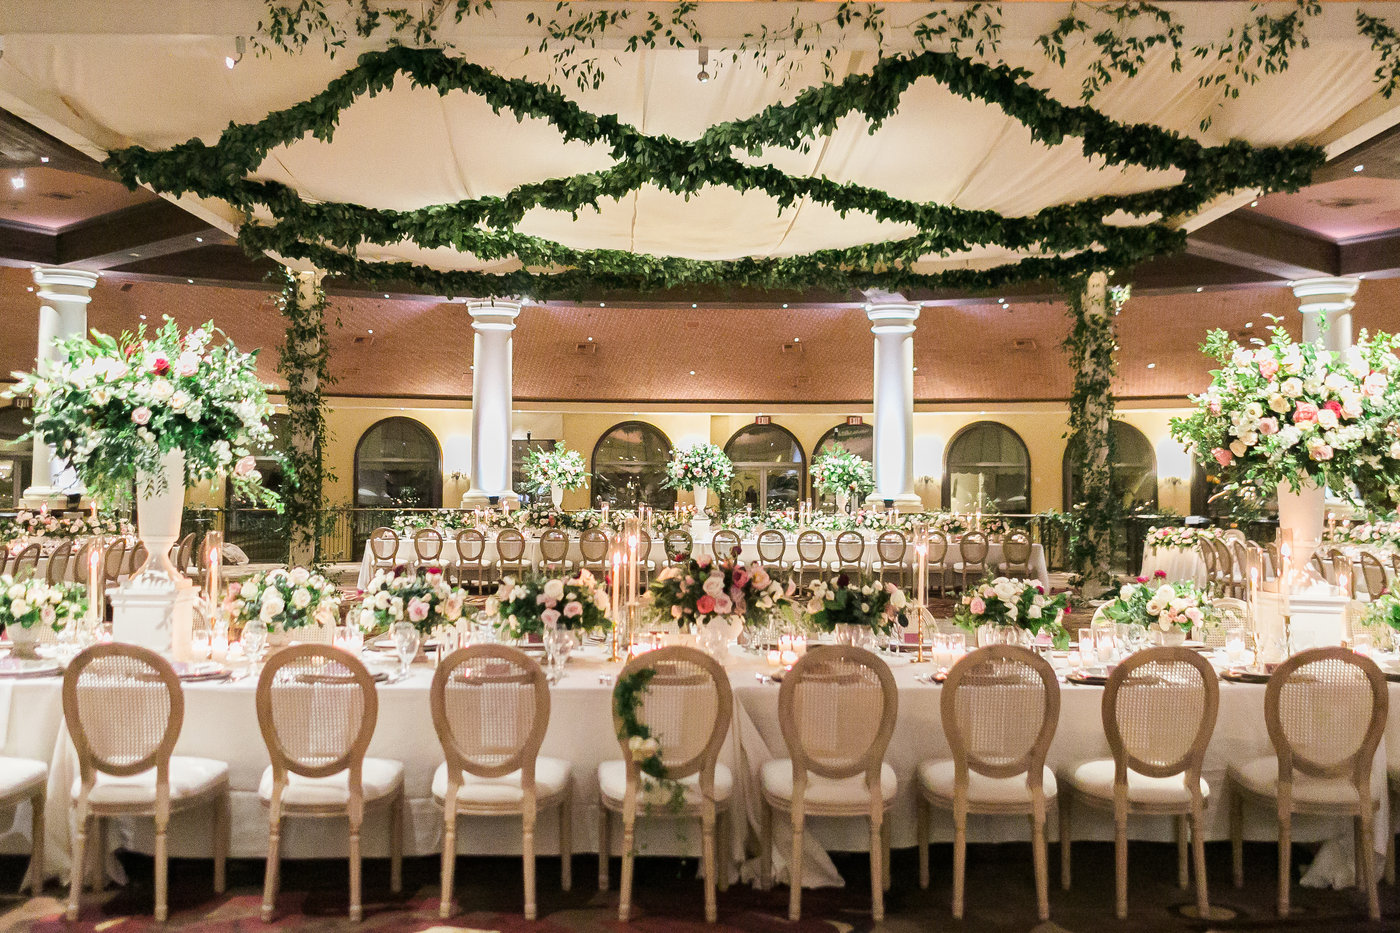 lush garden floral wedding reception las vegas wedding planner angelica rose events.jpg